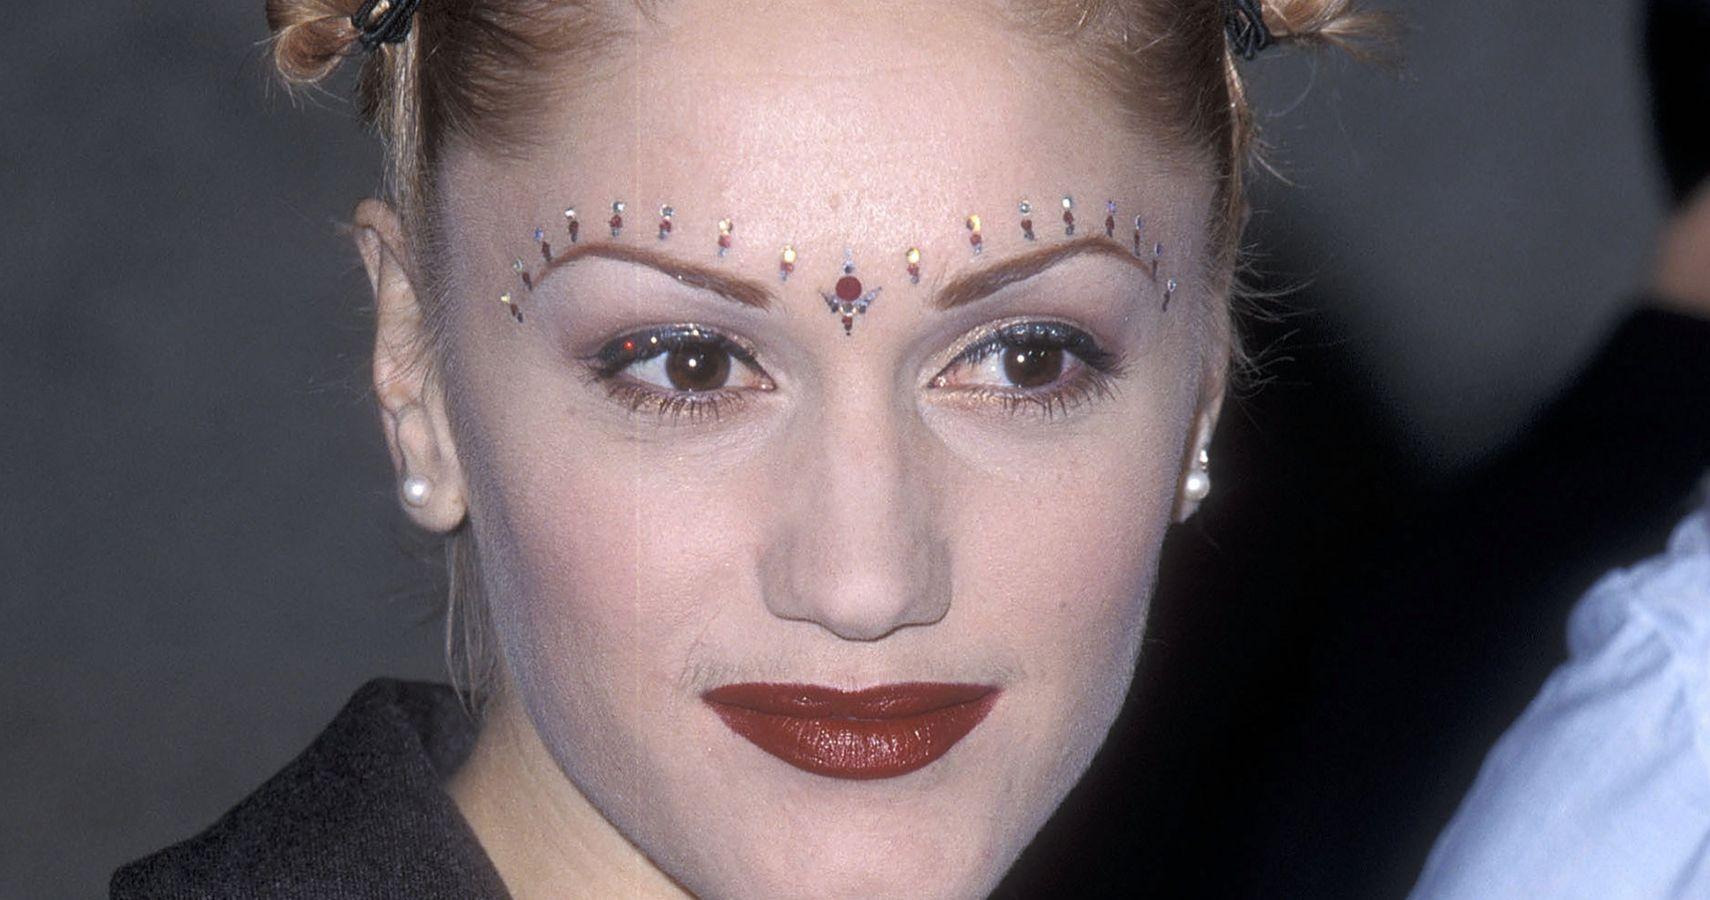 20 Makeup Trends That Shouldn't Ever Make a Comeback